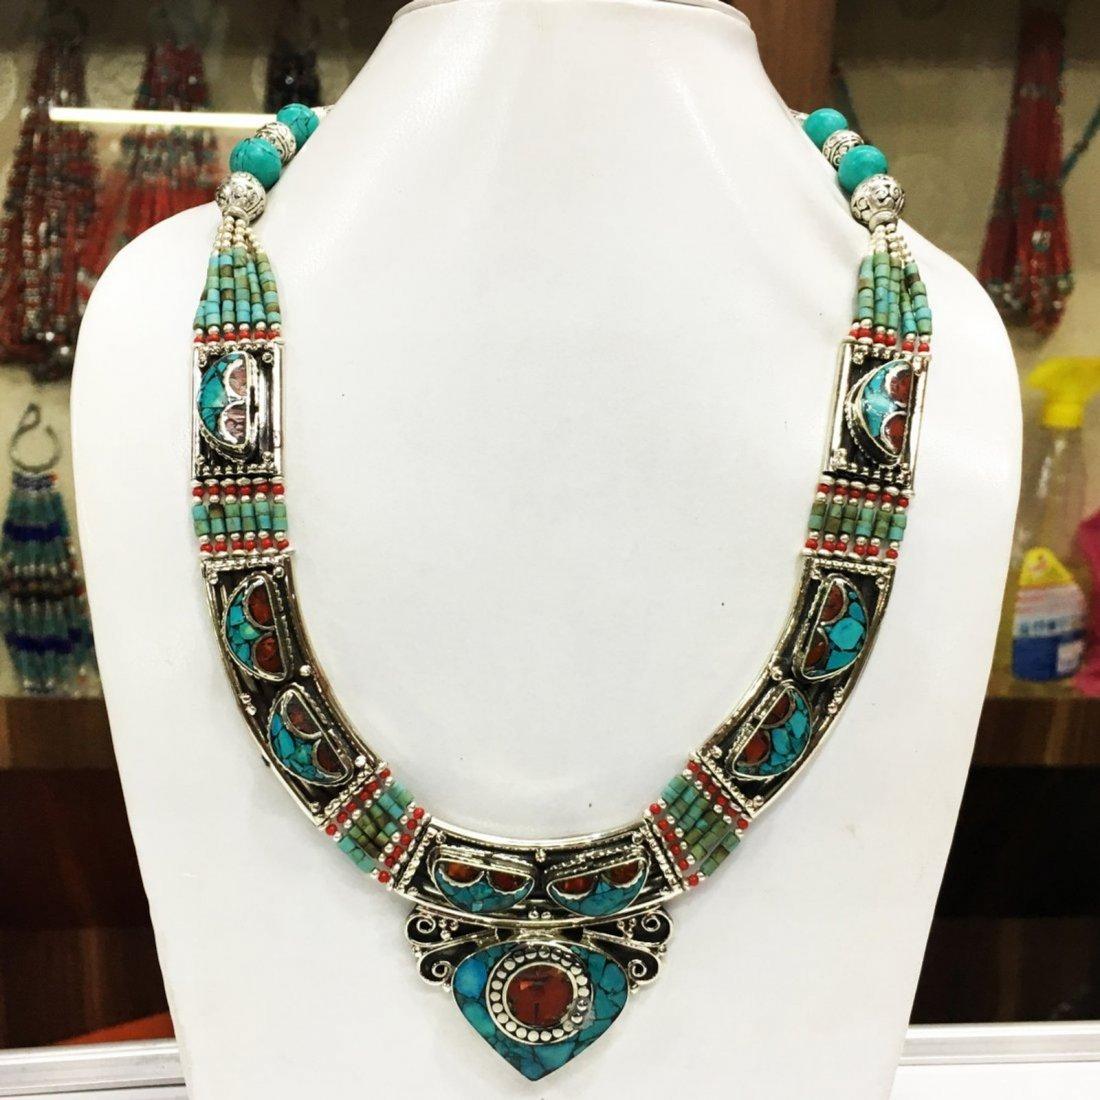 Gypsy Ethnic Antique Choker Handmade Necklace